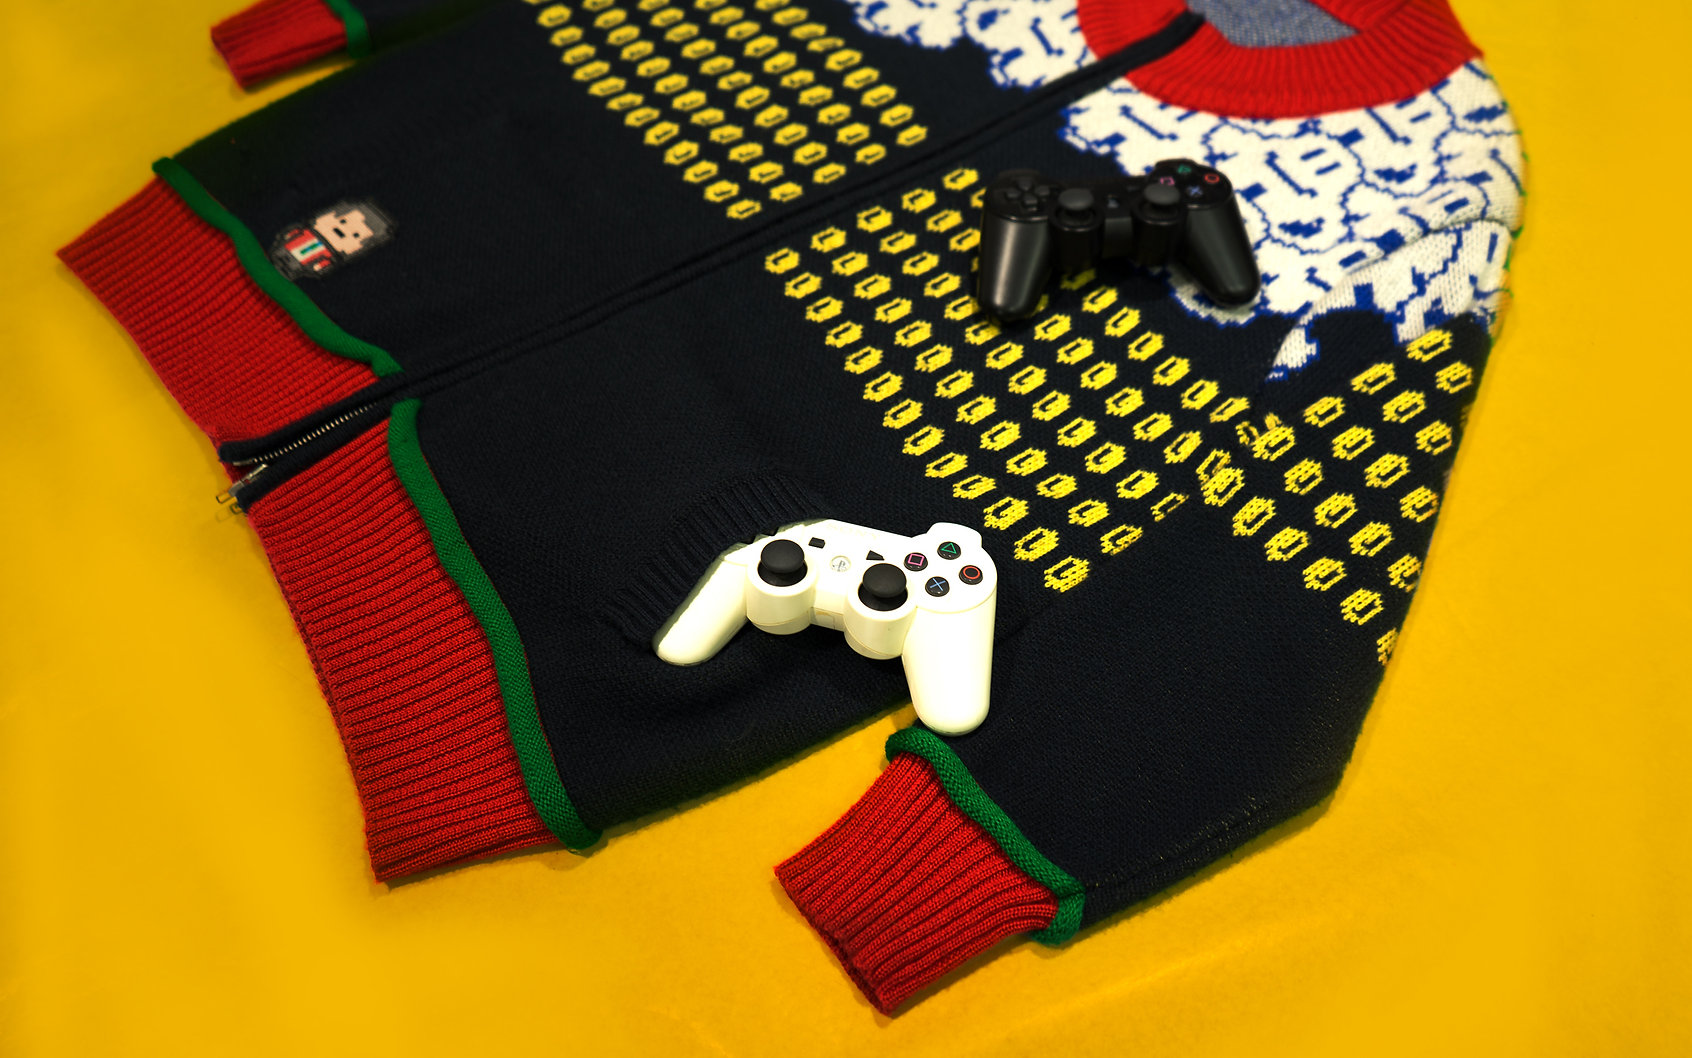 bkhstudio - uniform campaign - ref 8C.jp